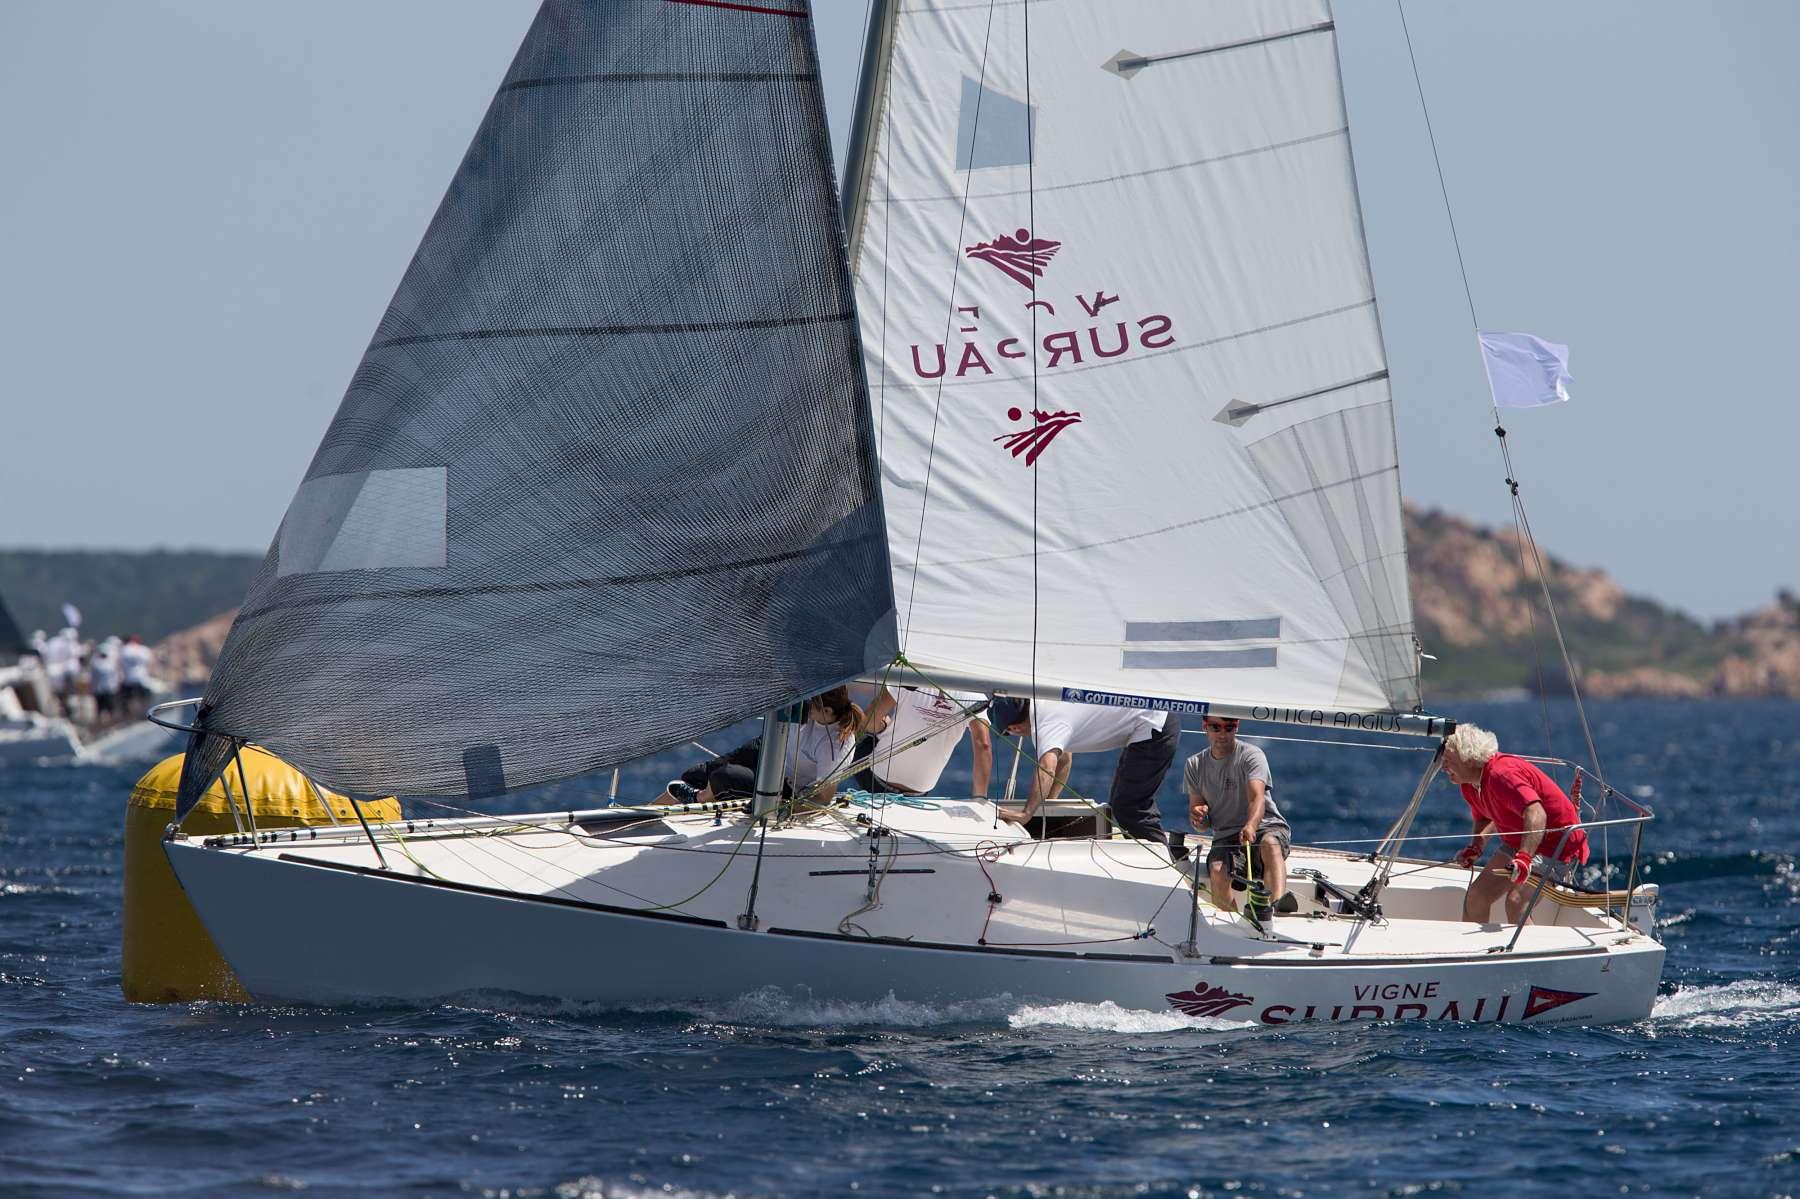 L'imbarcazione Vigne Surrau vince il Trofeo Challenge Alessandro Boeris Clemen - NEWS - Yacht Club Costa Smeralda